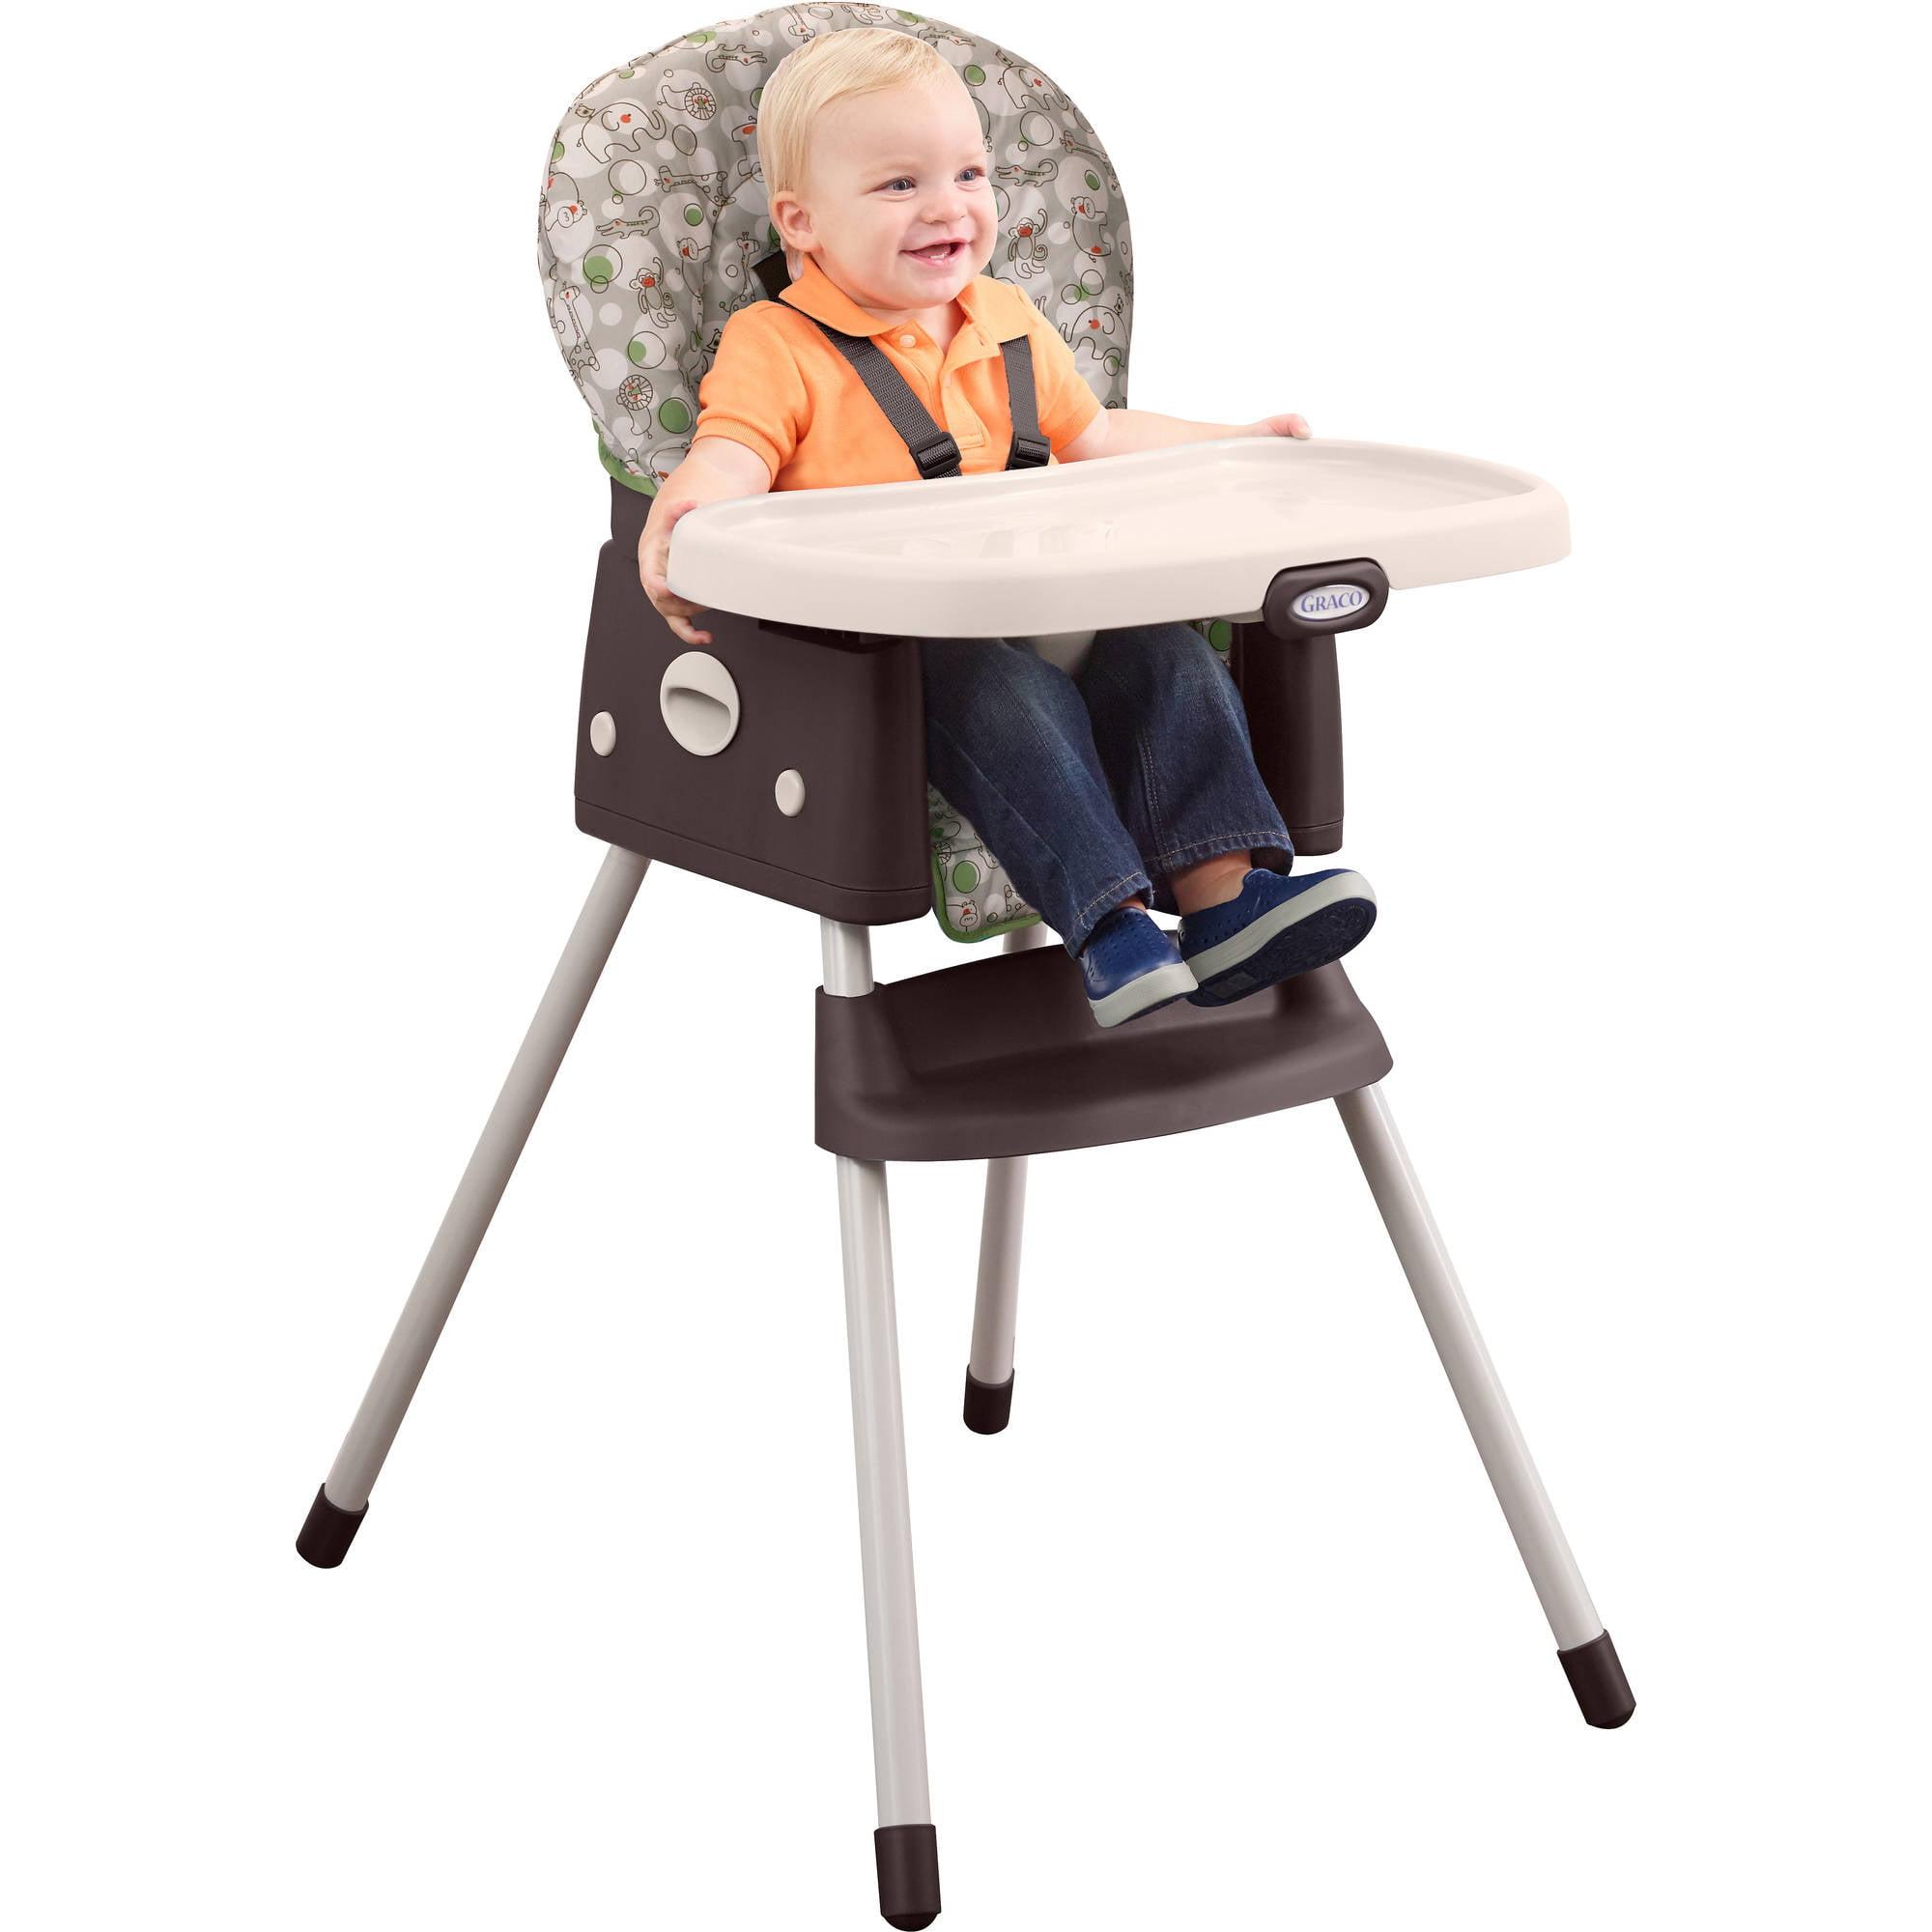 Graco SimpleSwitch 2 In 1 High Chair, Zuba   Walmart.com